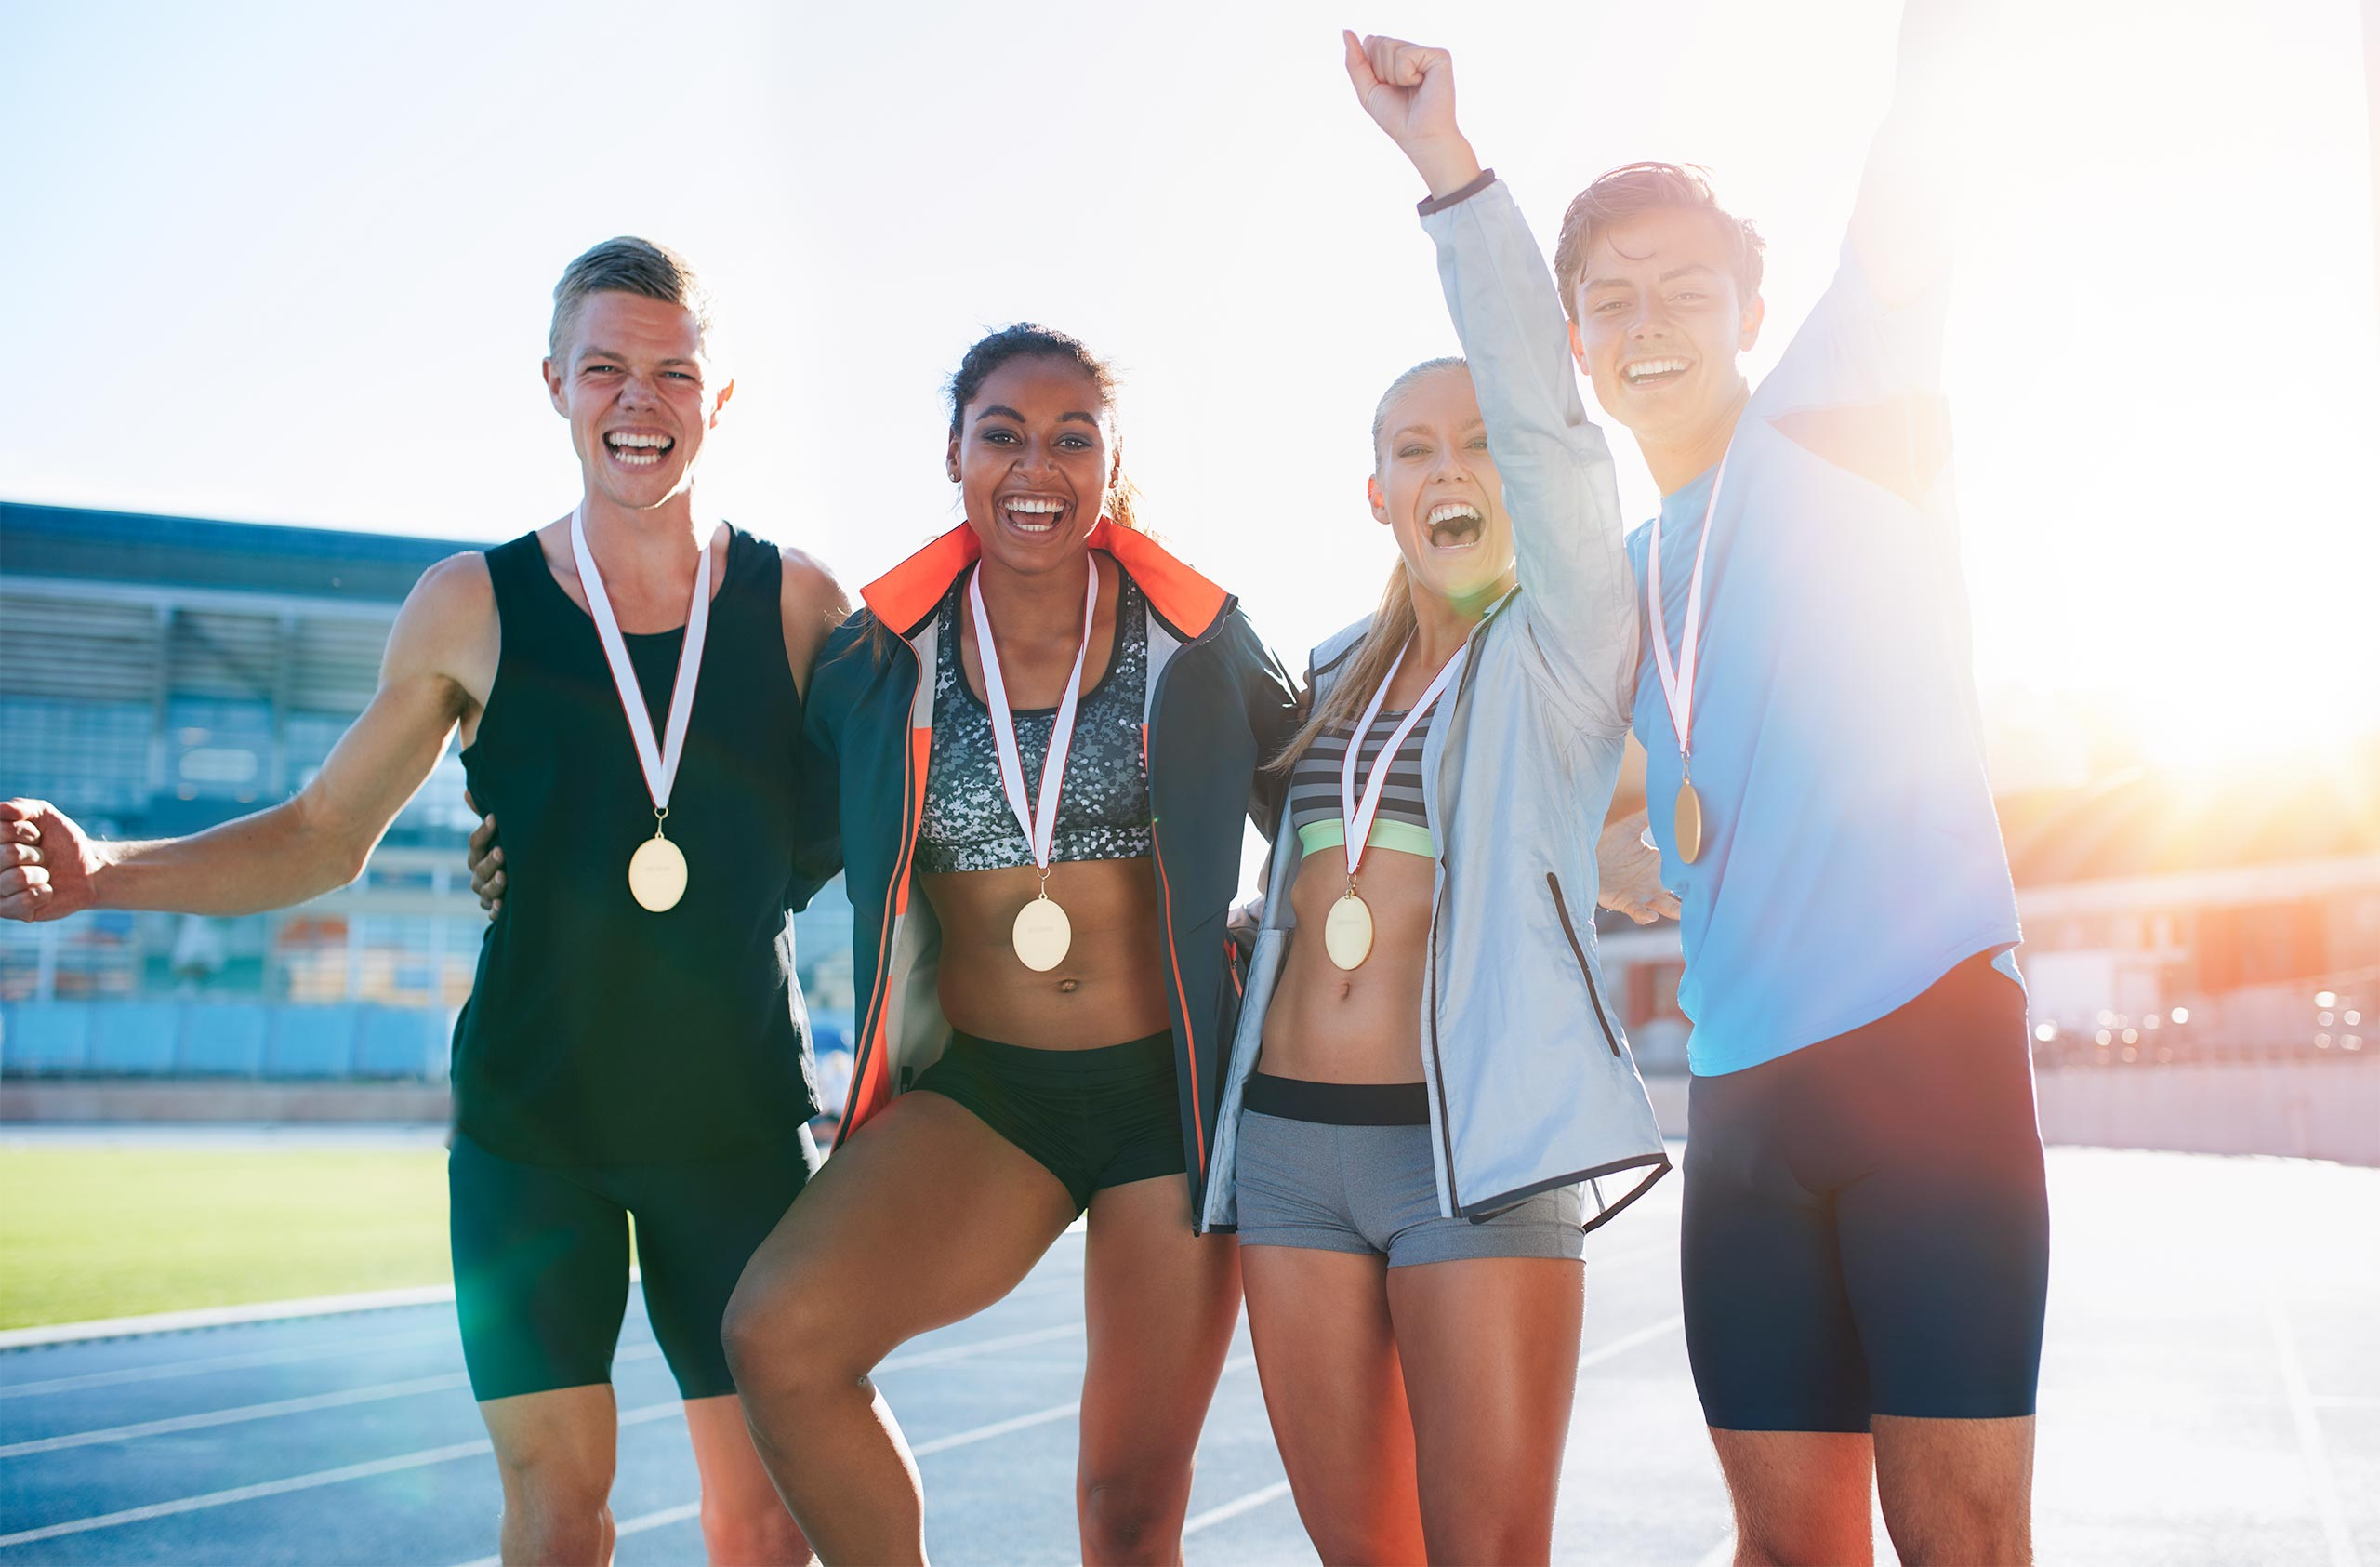 Kooperationen, Partnerschaften & Sponsoring - Sportzahnmedizin Bonn